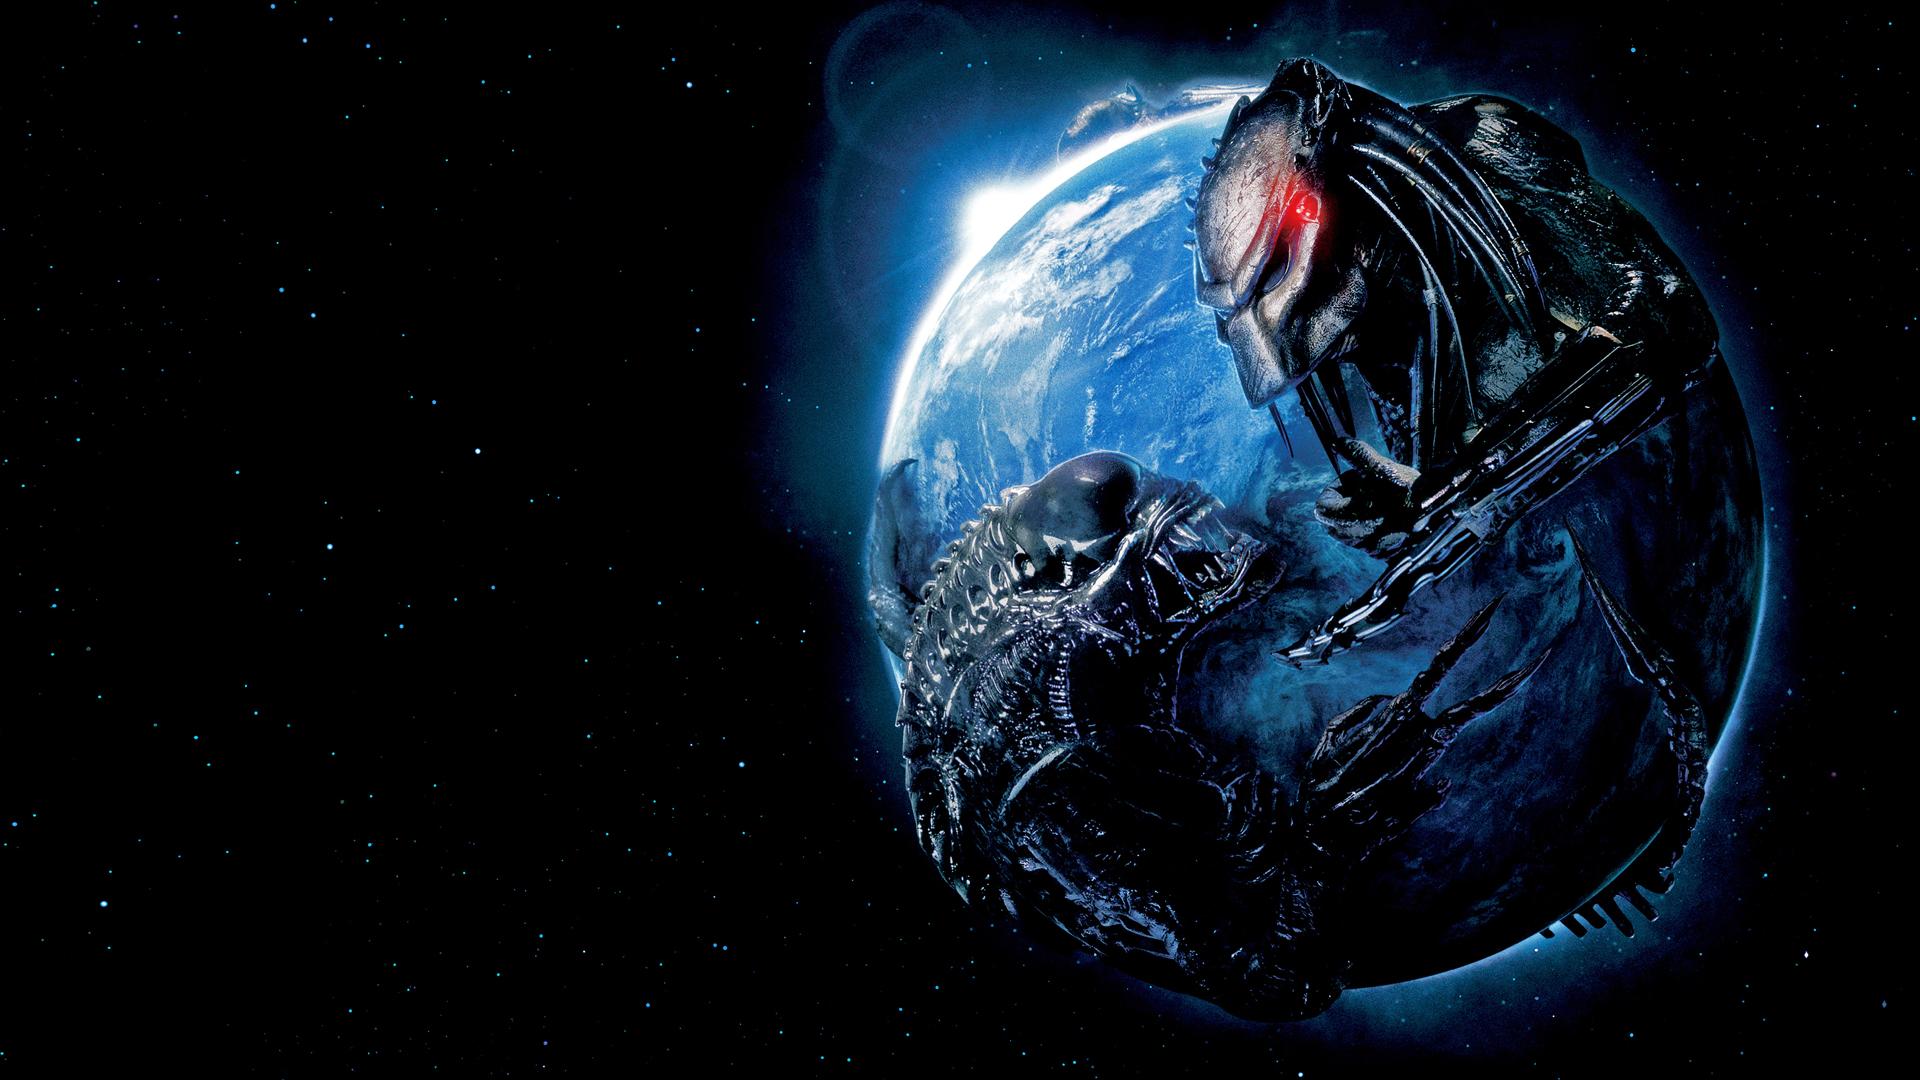 Alien Vs Predator wallpaper 1920x1080 1   hebusorg   High 1920x1080